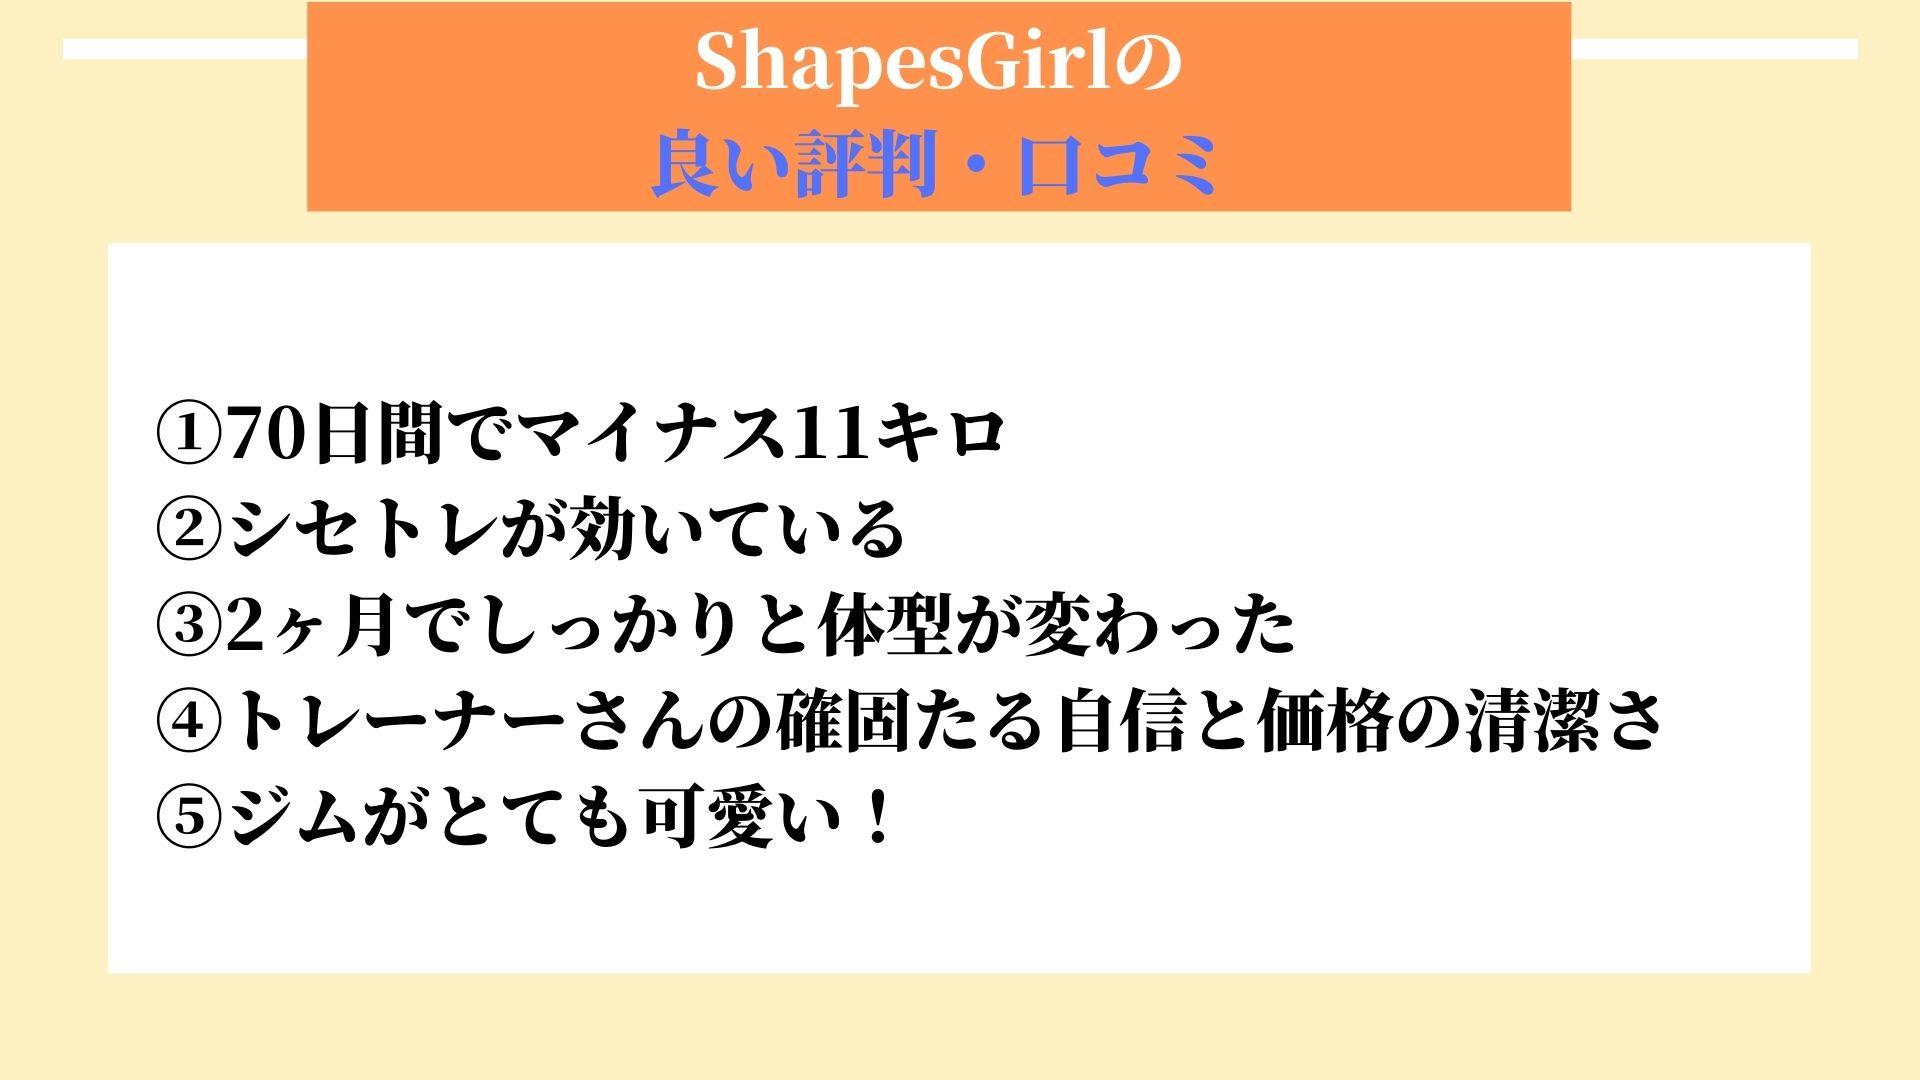 ShapesGirl 良い評判・口コミ